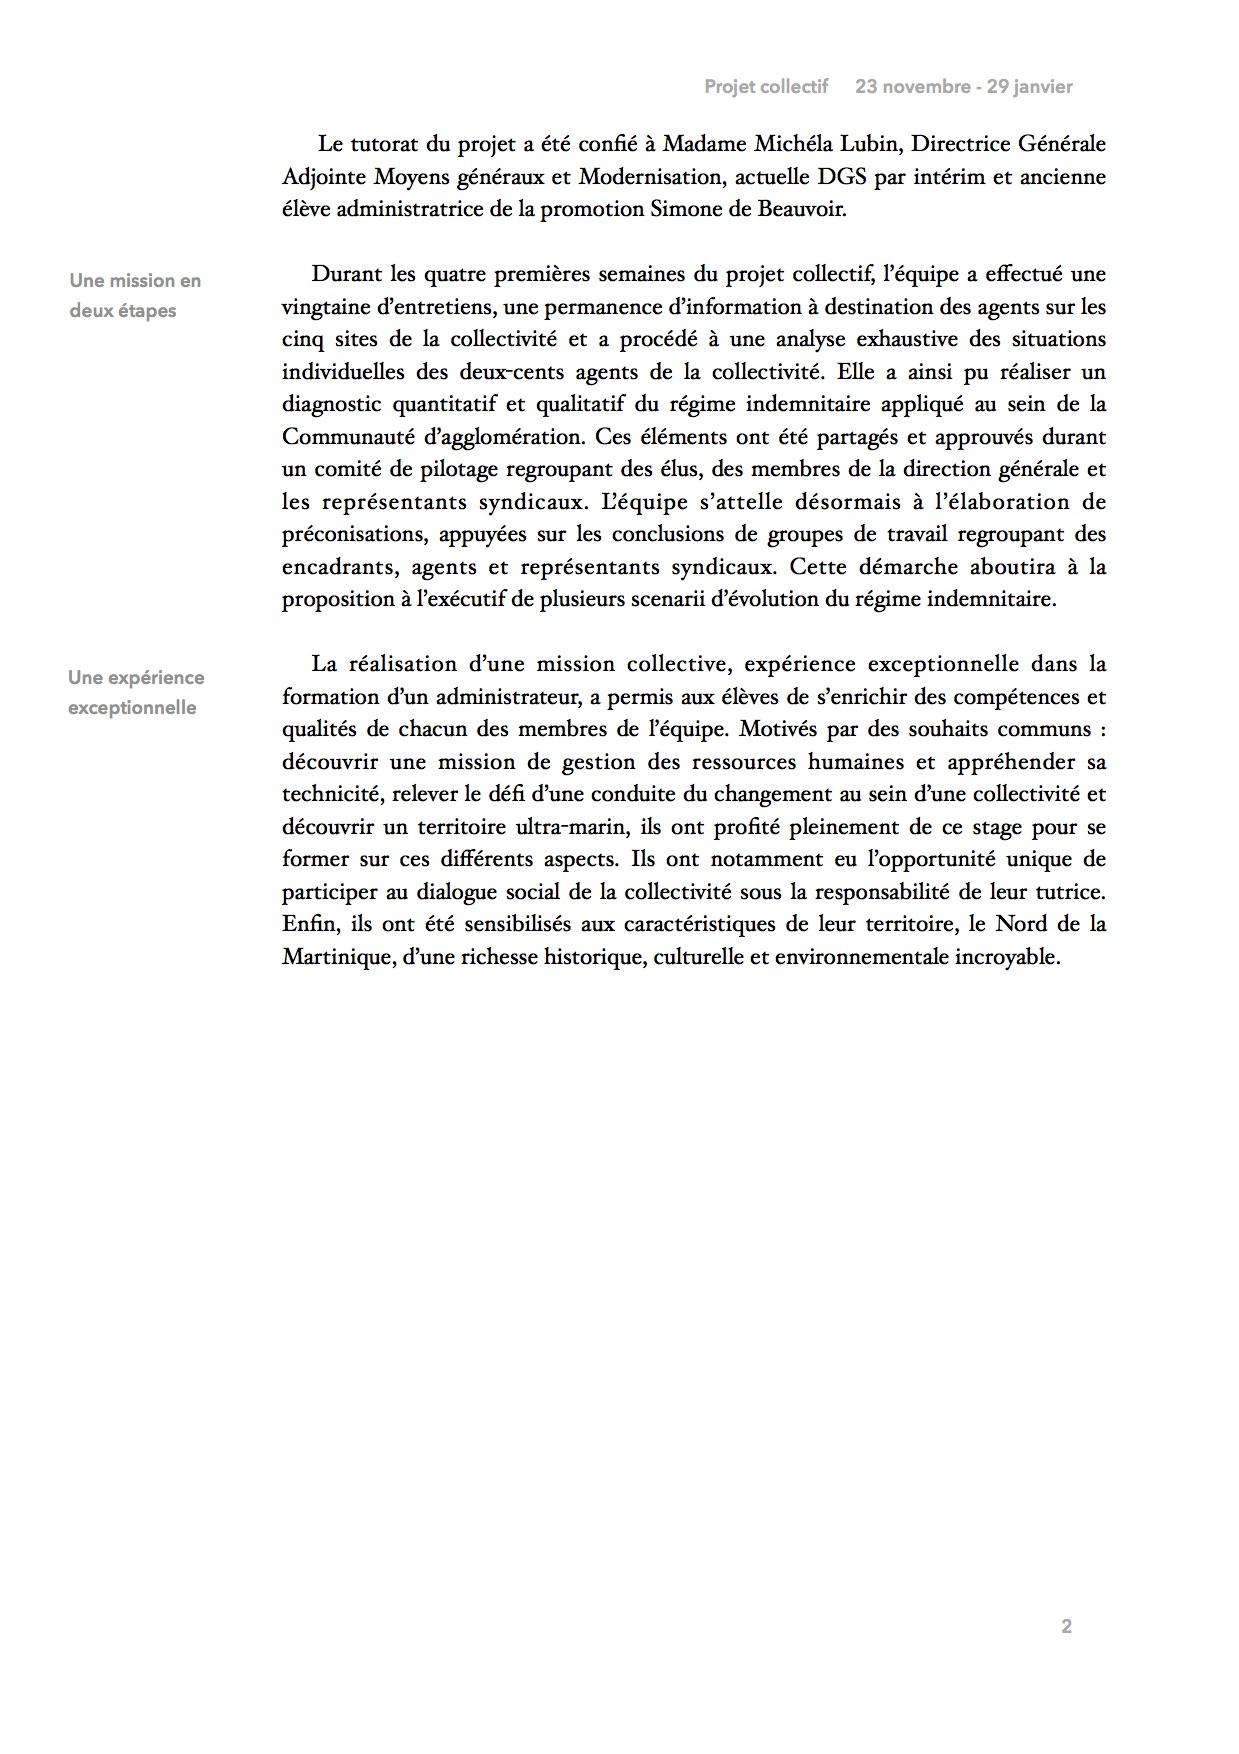 Le projet collectif, page 2